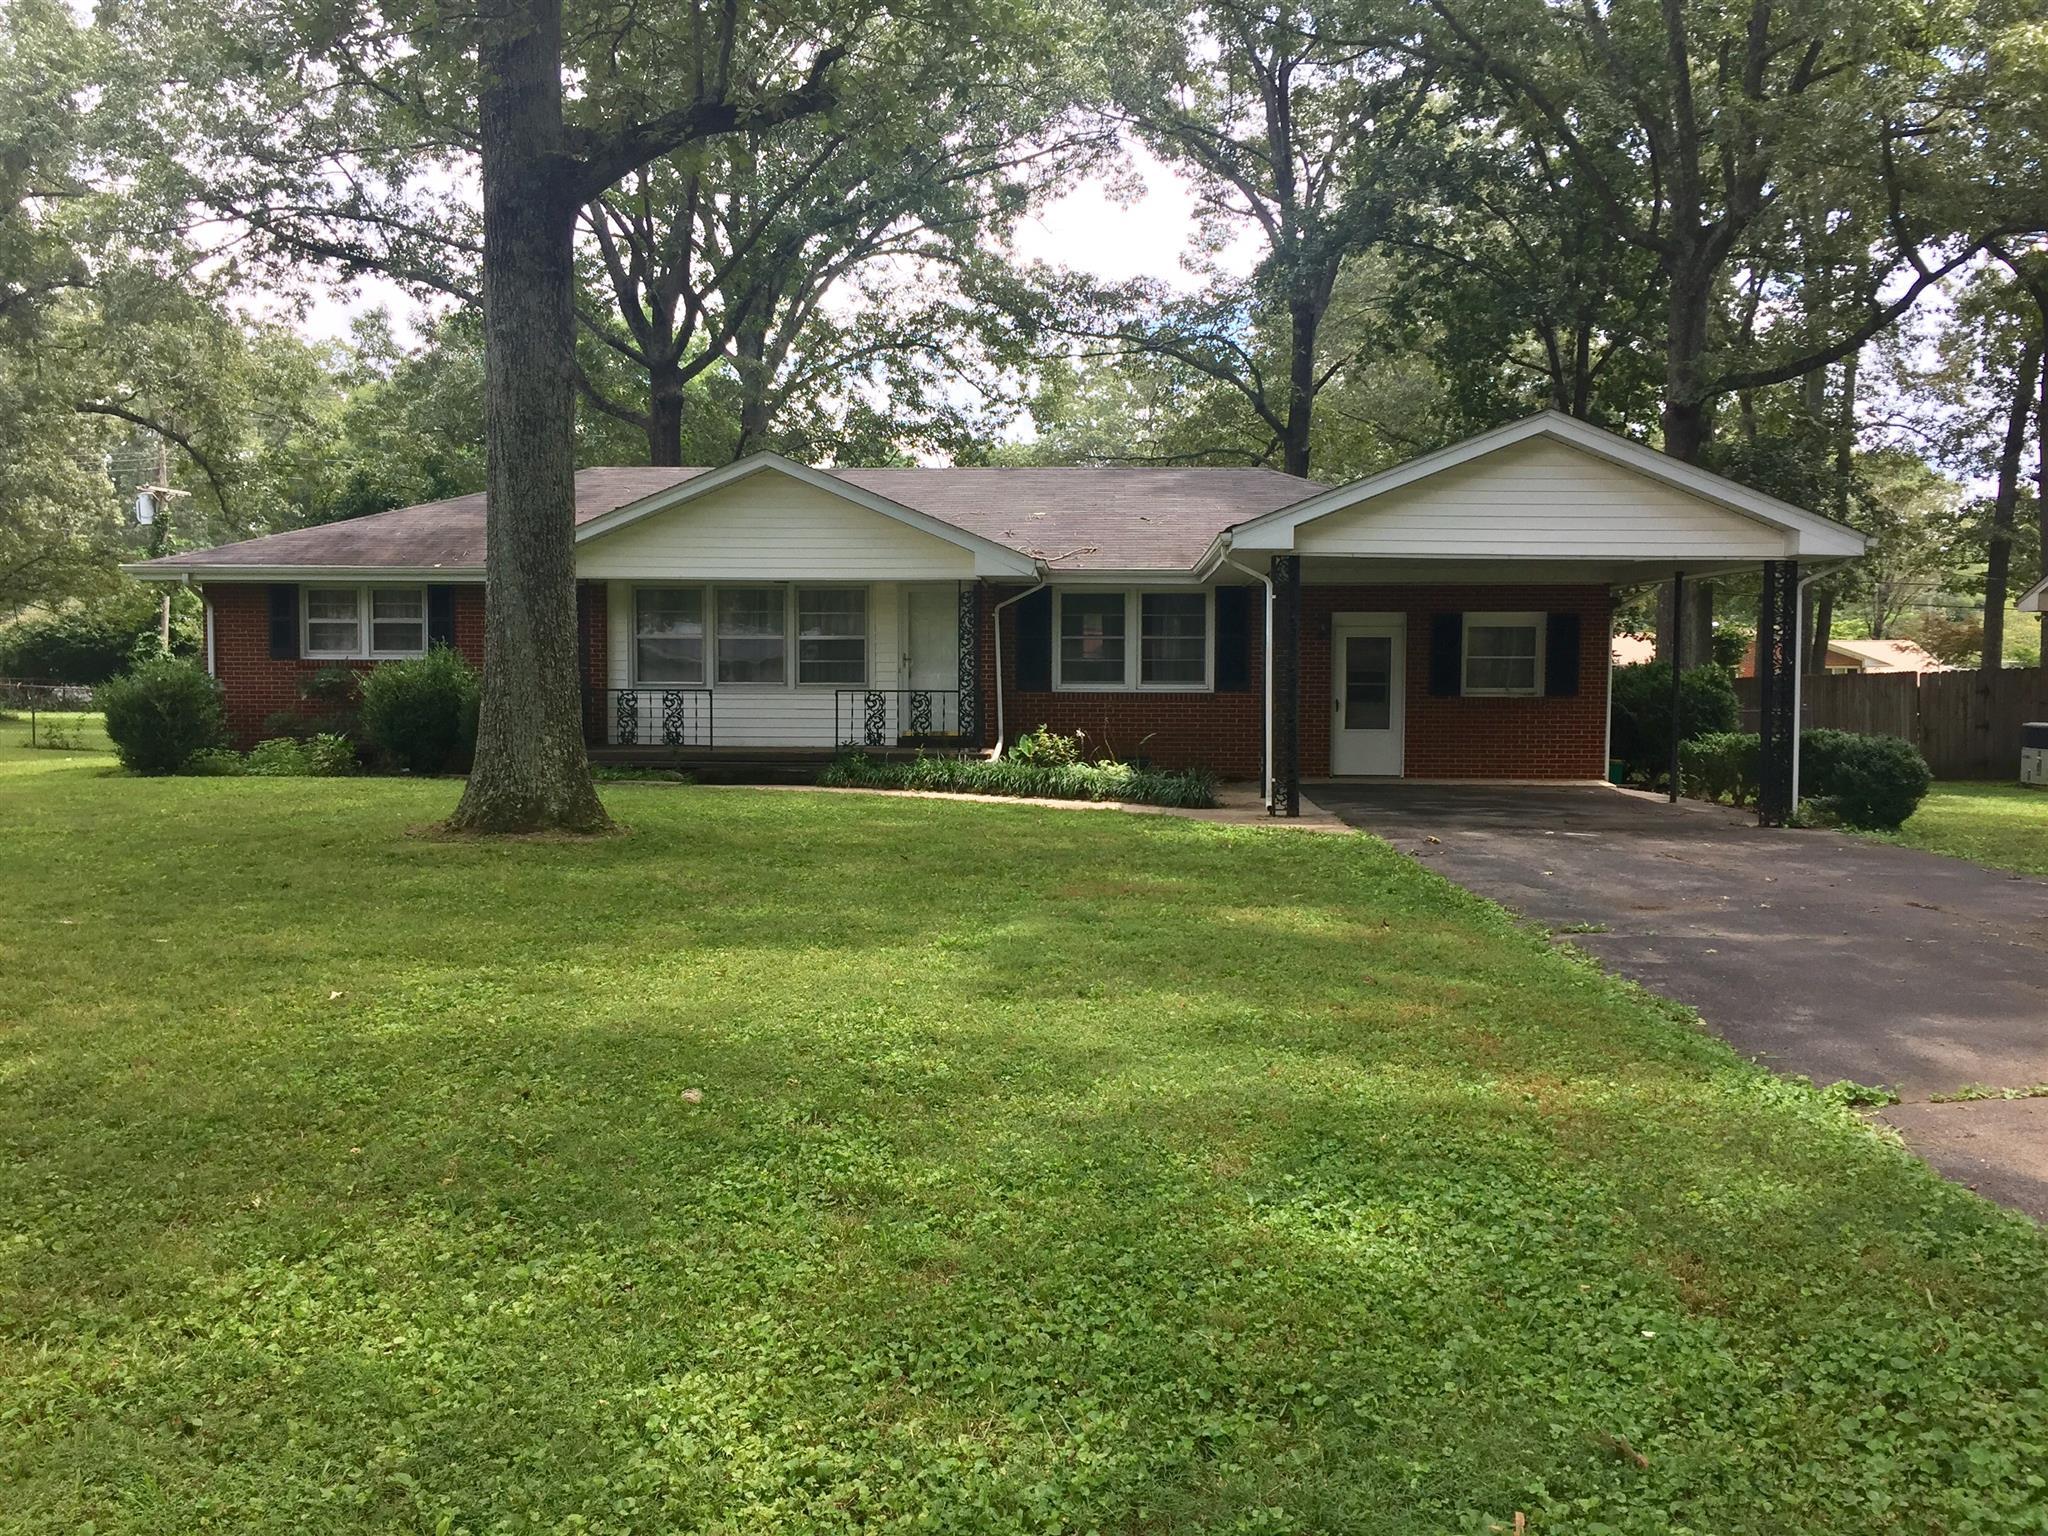 1107 Westwood Dr, Tullahoma, TN 37388 - Tullahoma, TN real estate listing